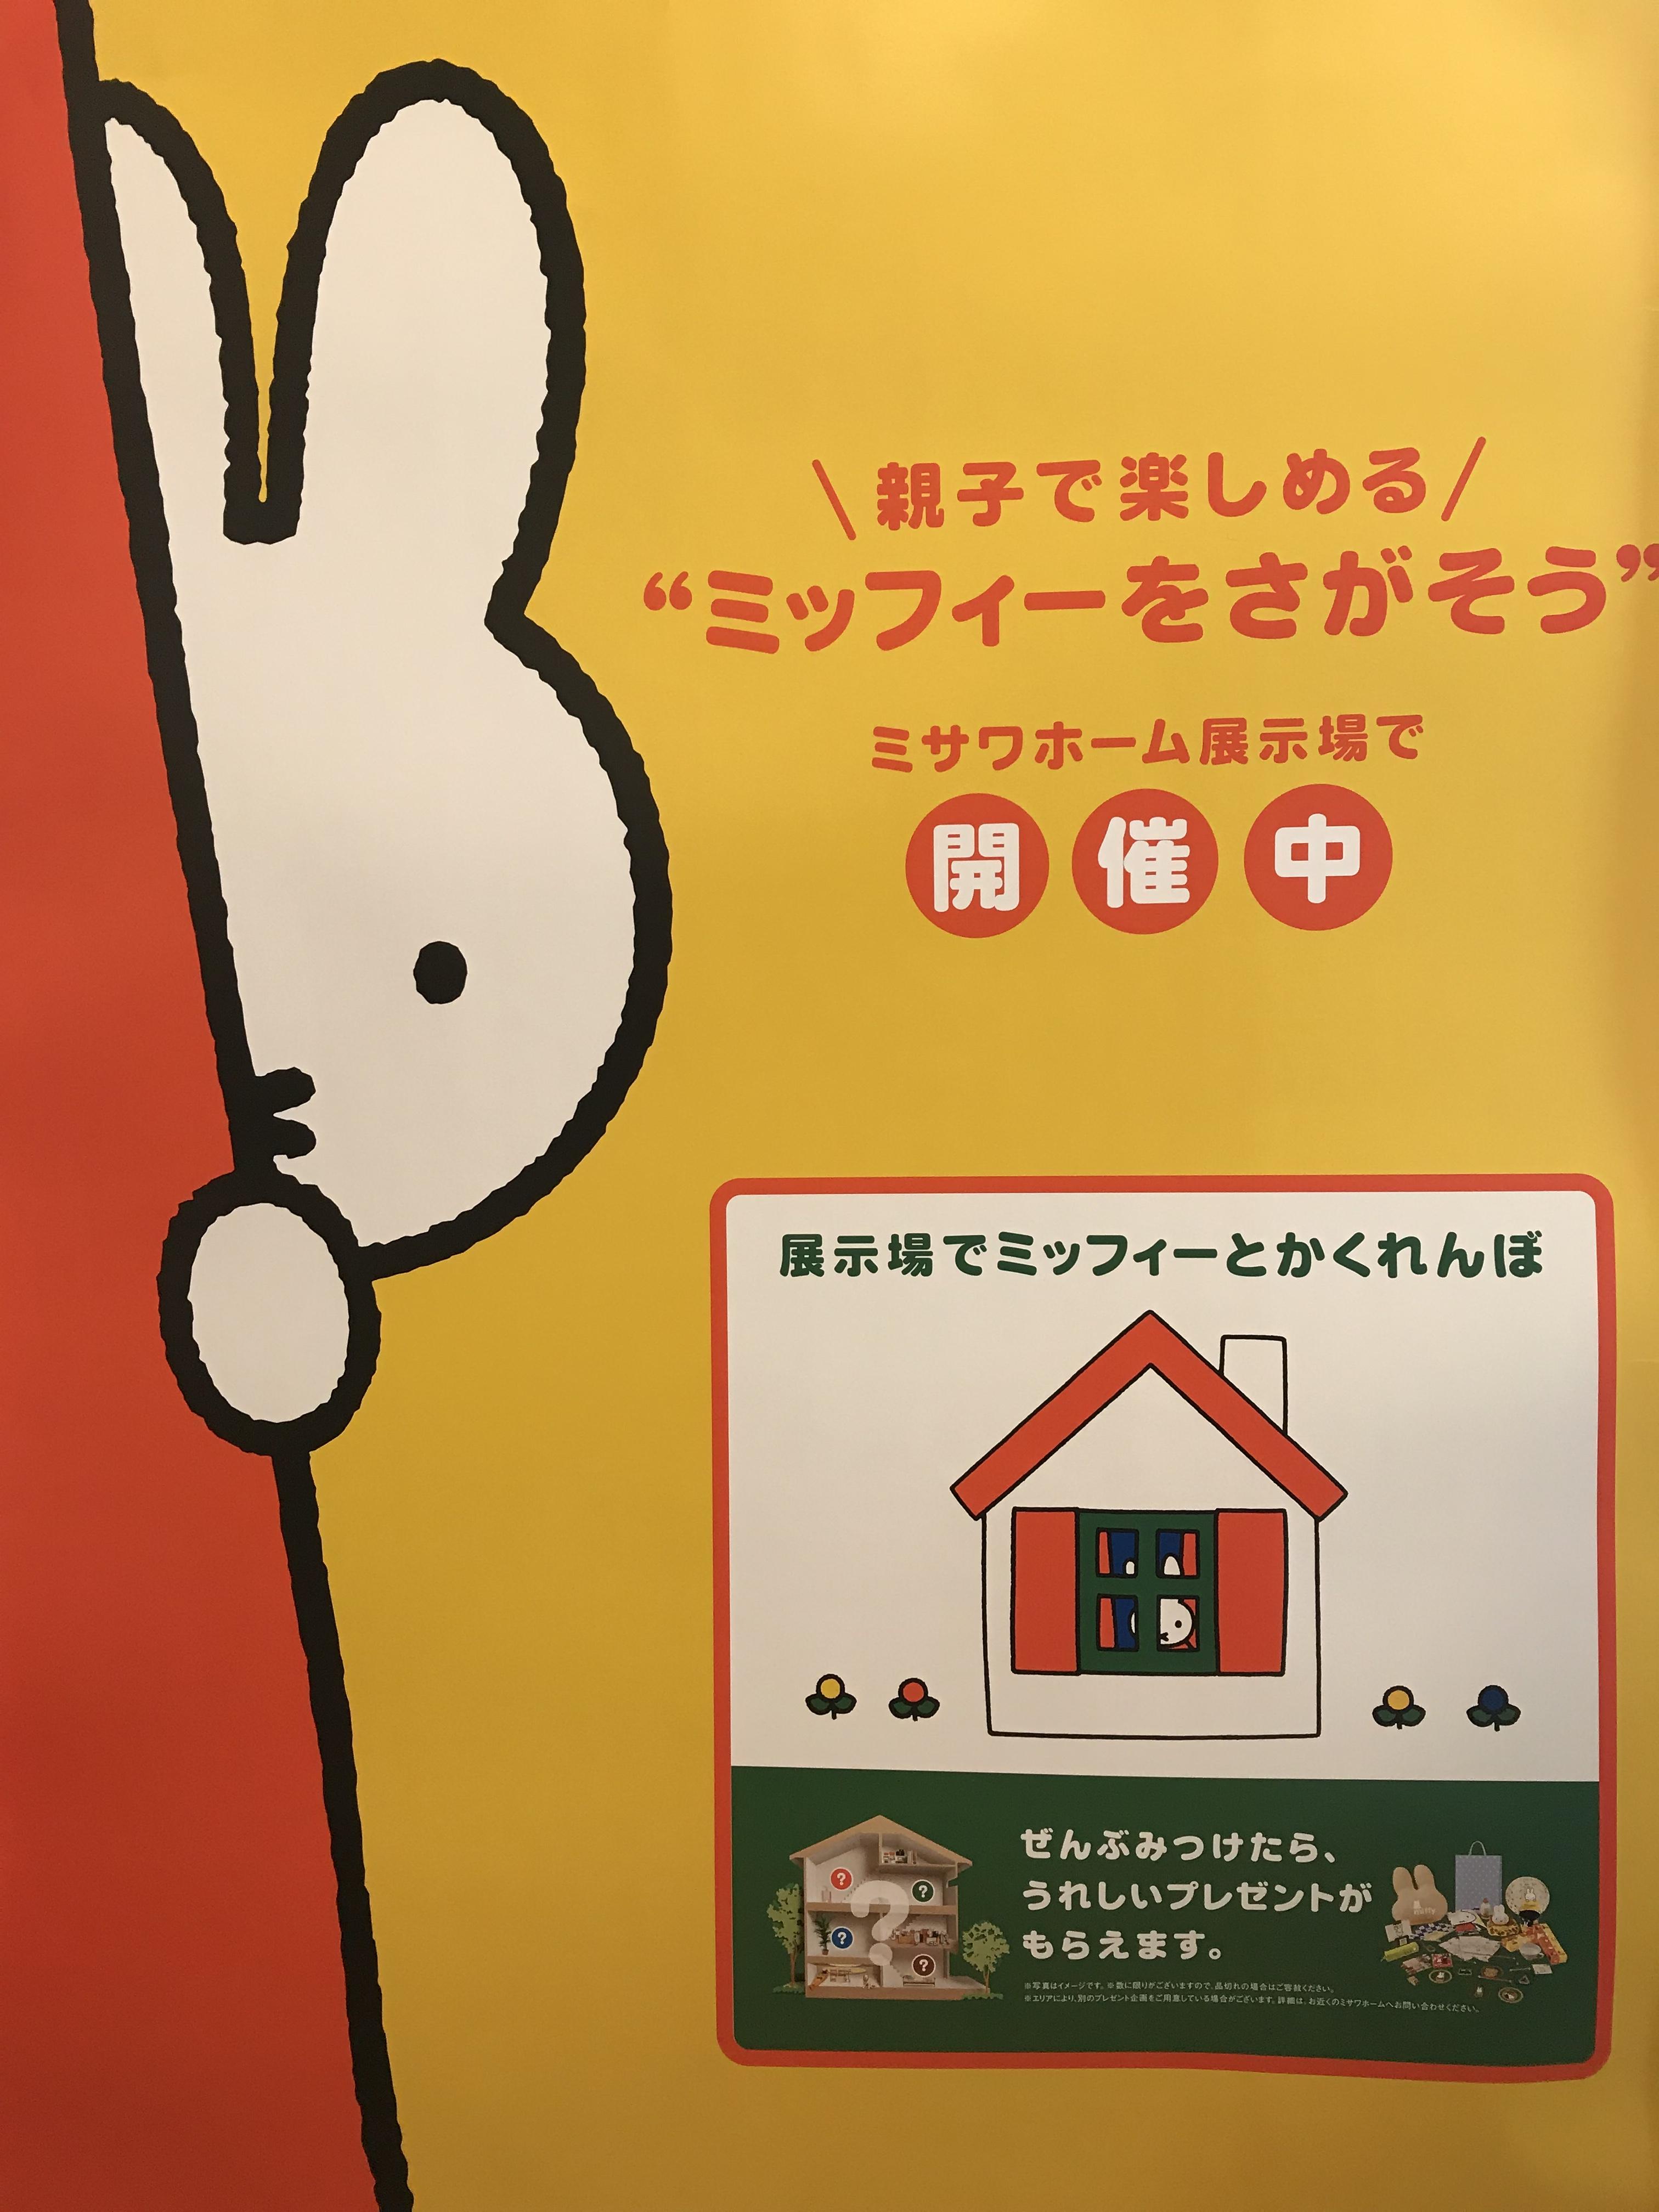 http://shikoku.misawa.co.jp/area_kouchi/%E3%83%9F%E3%83%83%E3%83%95%E3%82%A3%E3%83%BC%E3%82%92%E6%8E%A2%E3%81%9D%E3%81%86.jpeg